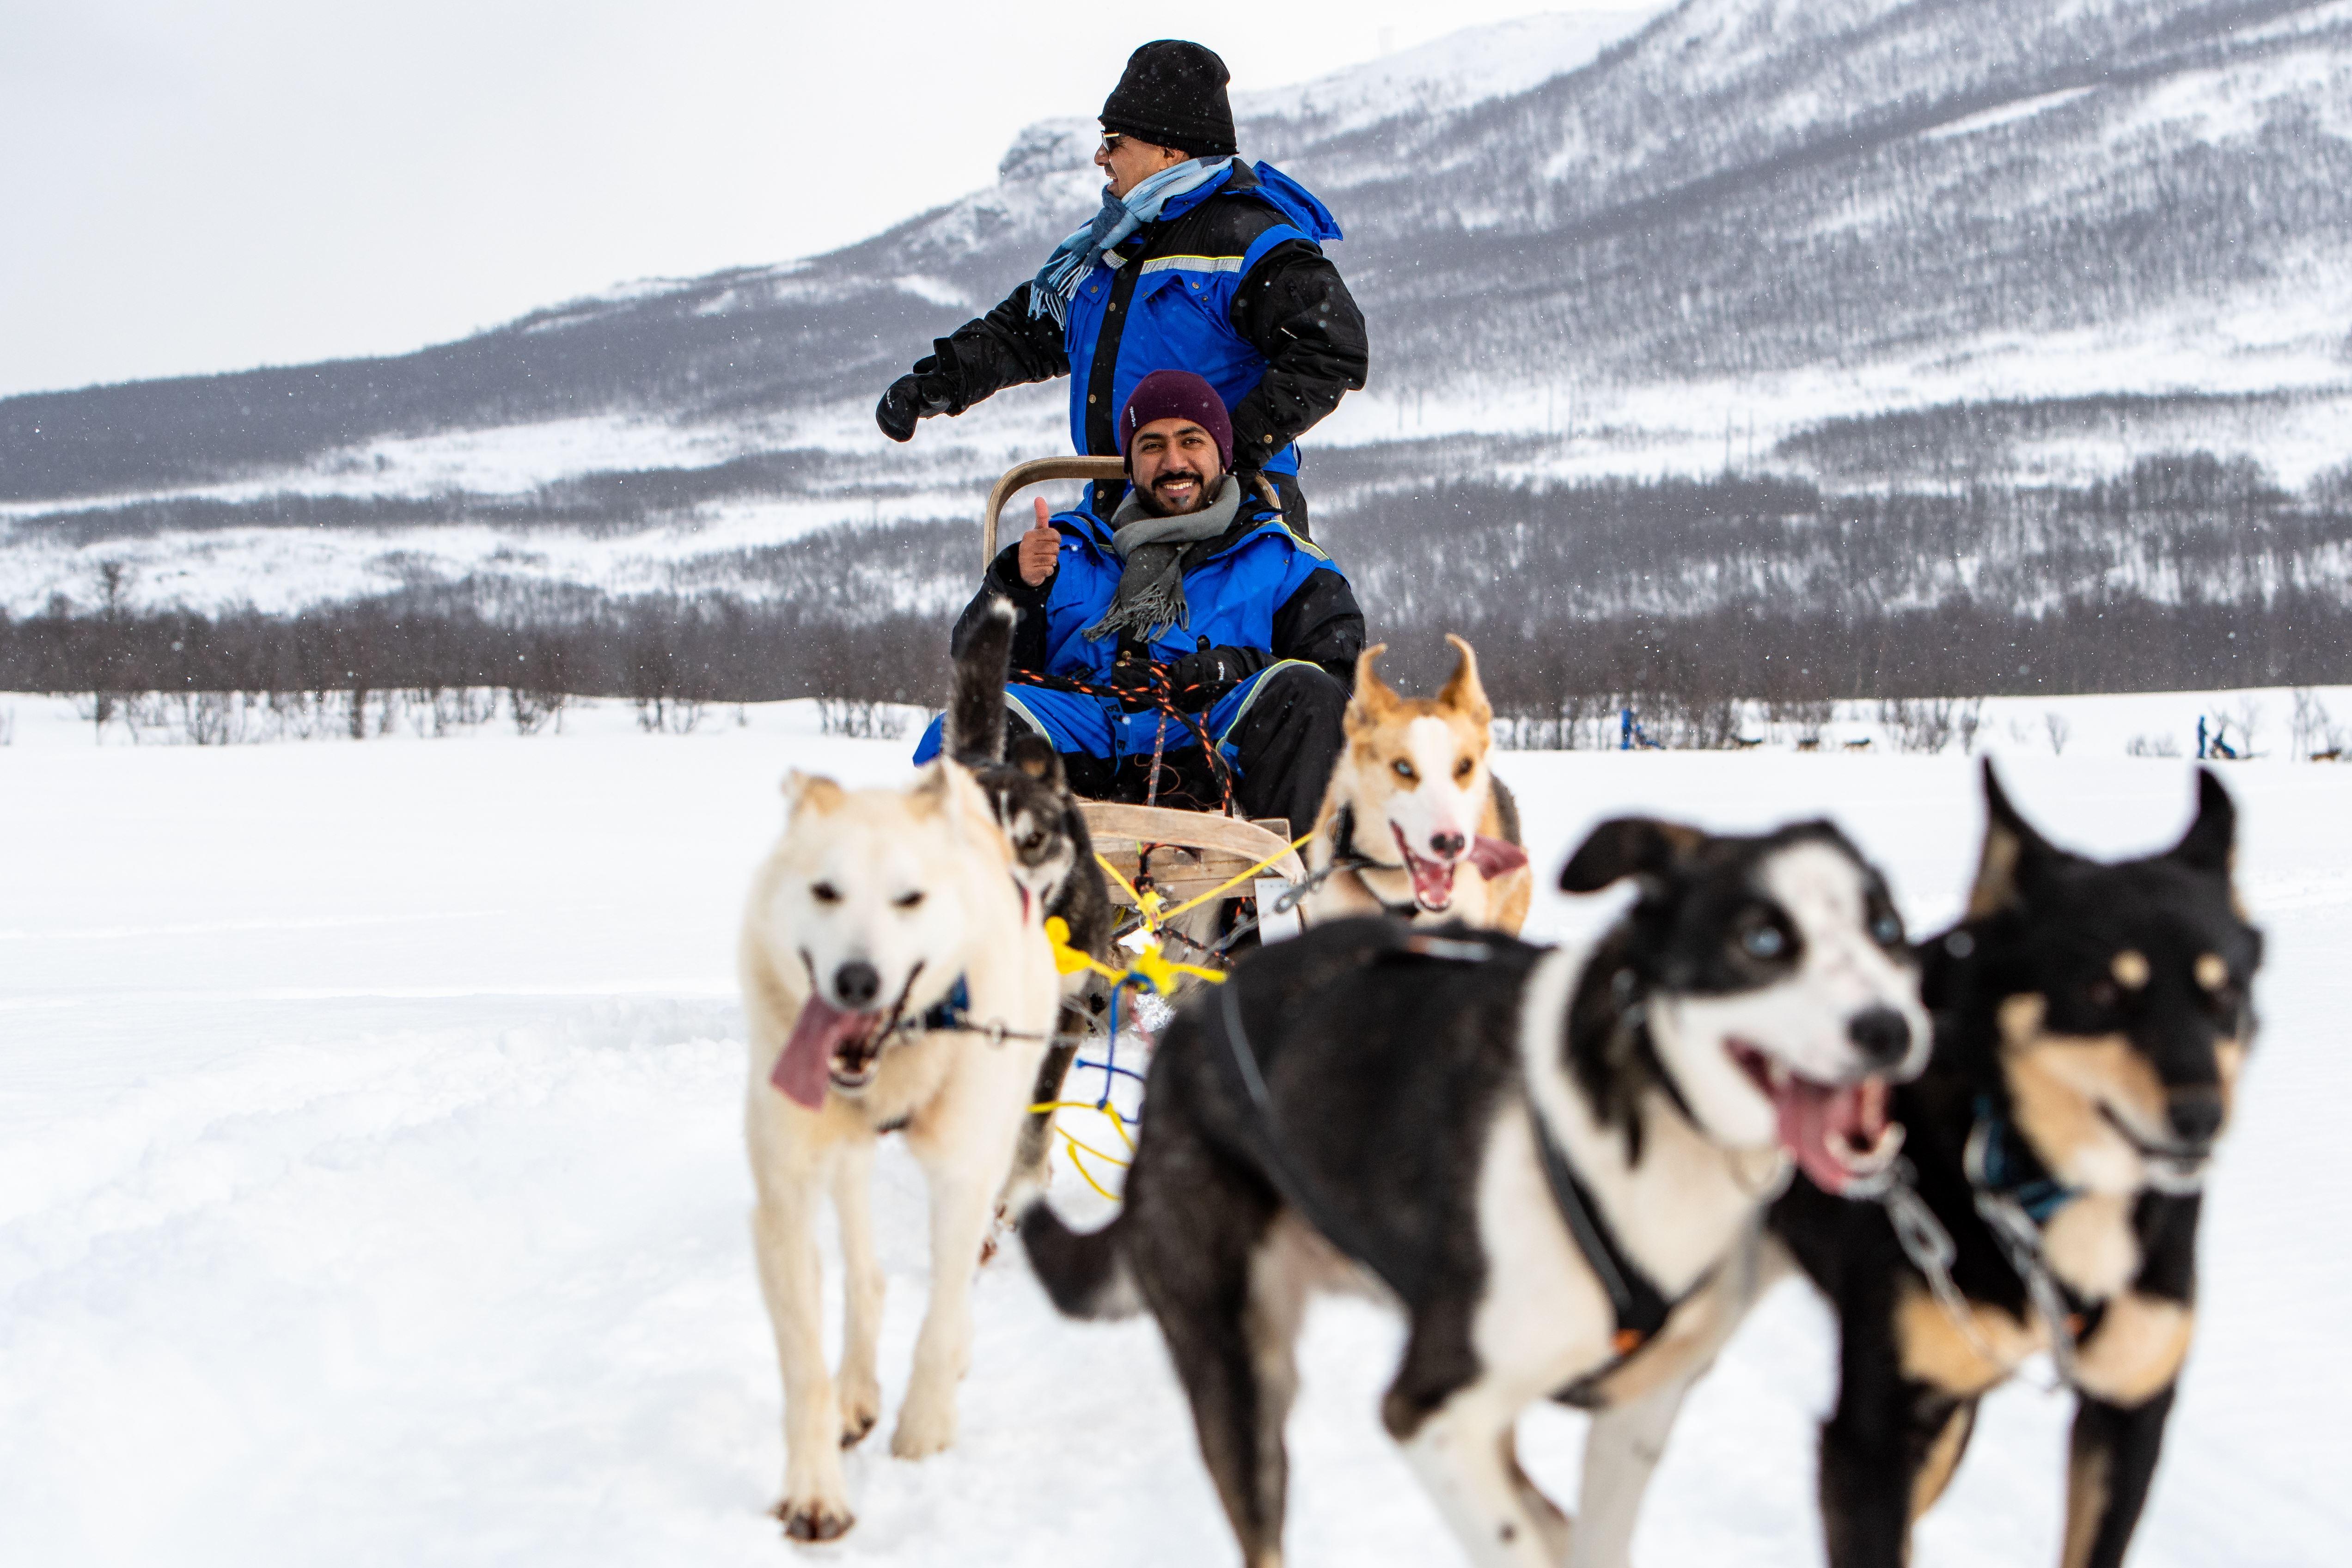 Dogsledding: 13.00 -17.30 - Aurora Alps